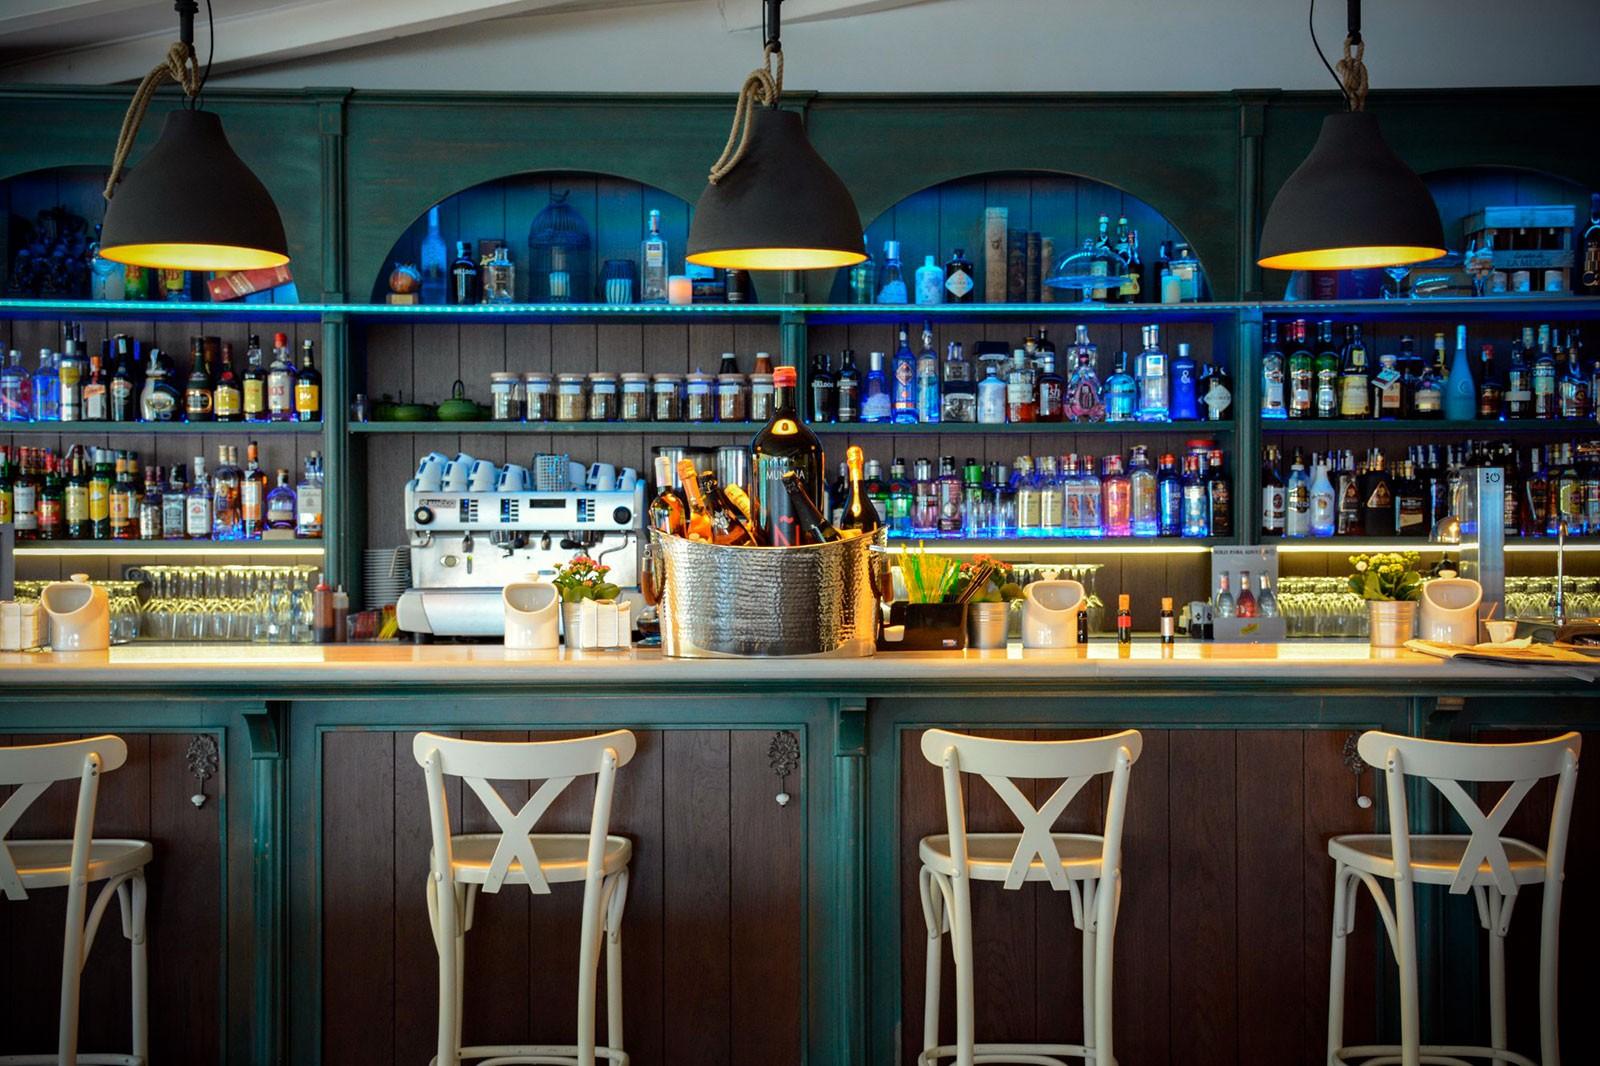 restaurante_lacompania8